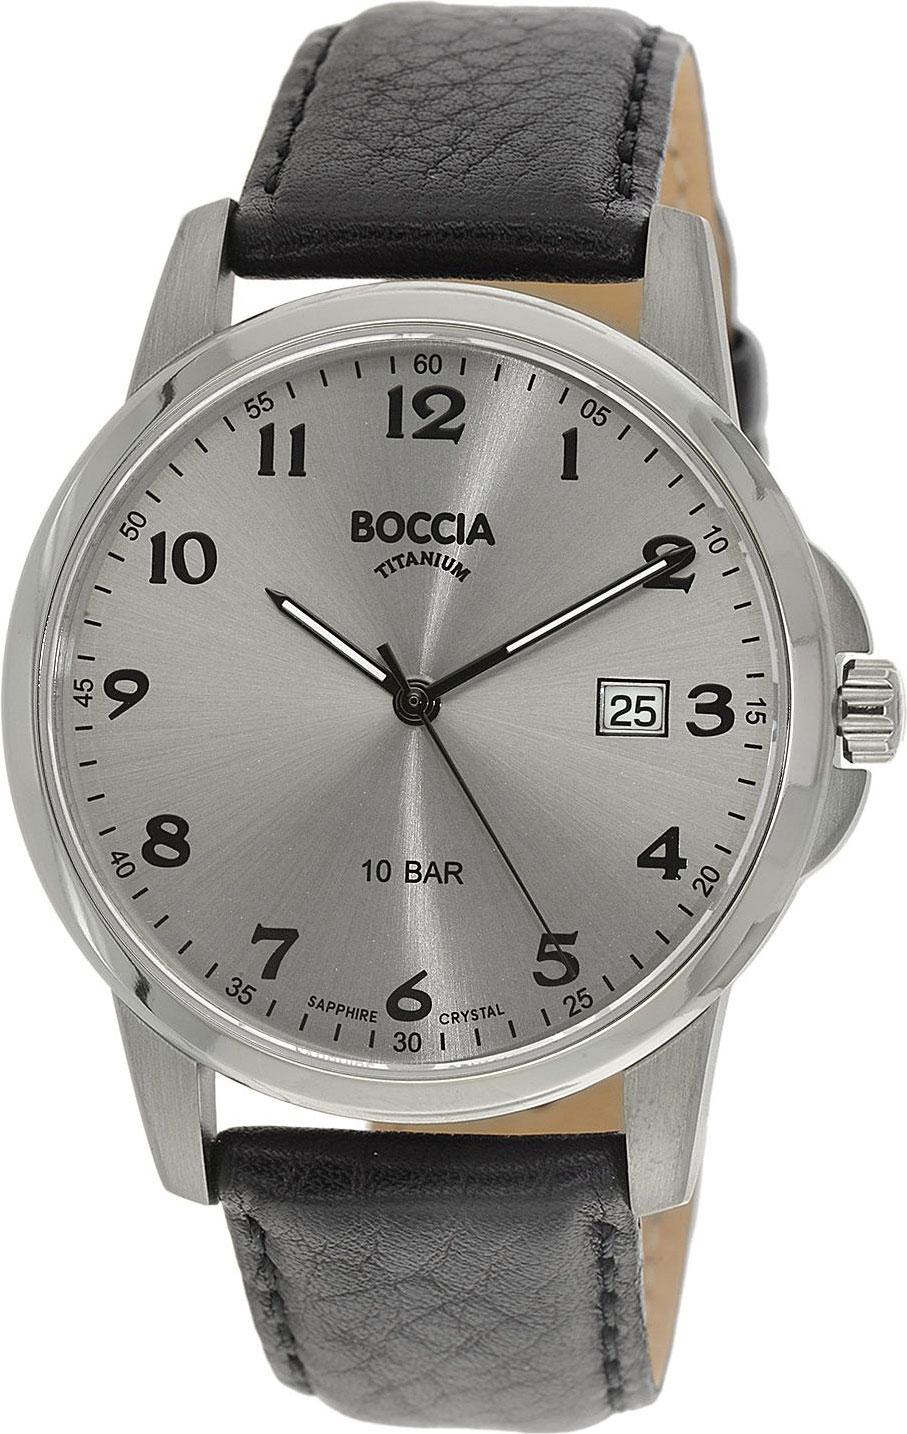 Мужские часы Boccia Titanium 3633-03 цена и фото